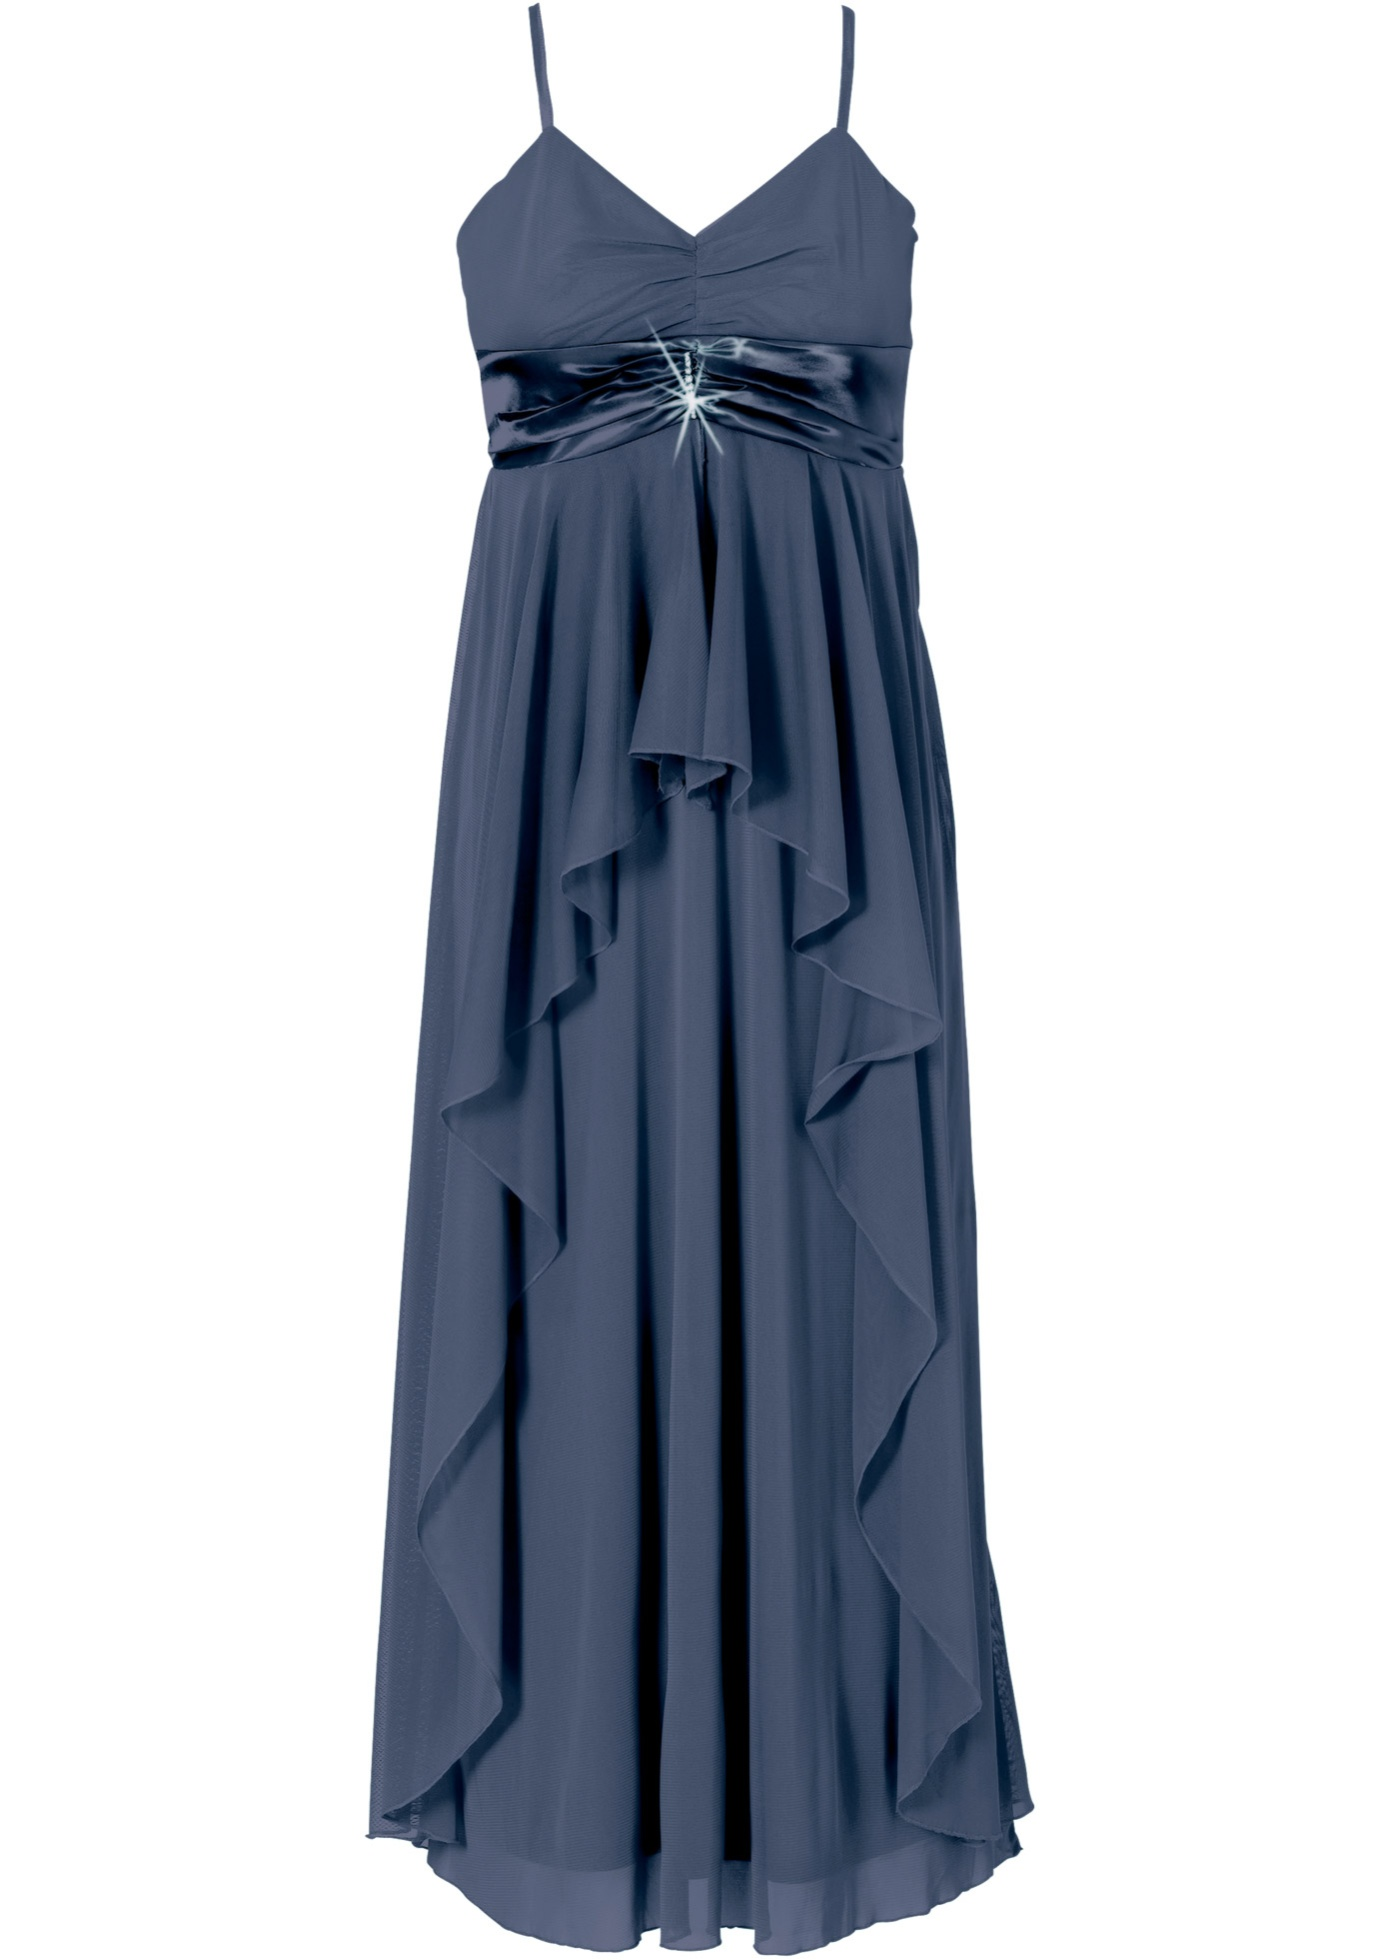 BonprixRobe Manches Longue Bleu Sans Pour Bodyflirt D'été Femme nm0wONyv8P